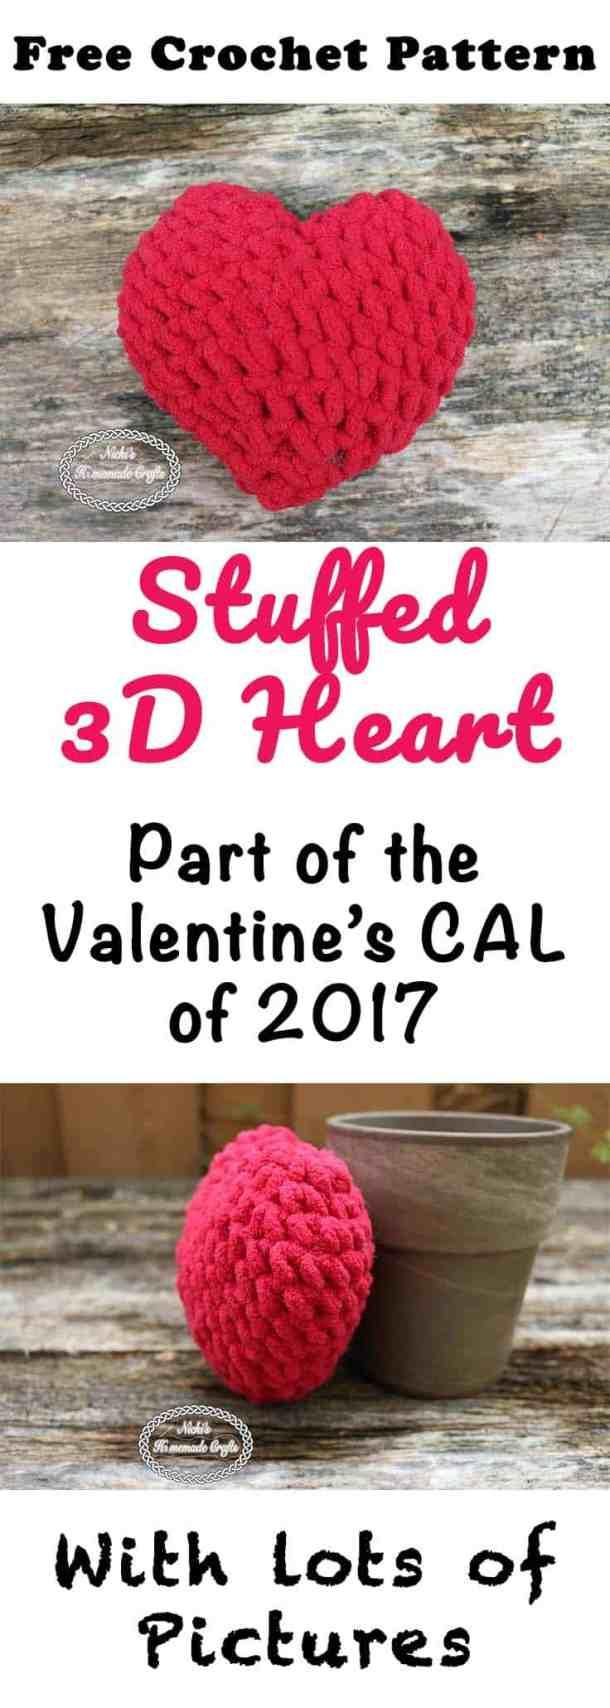 Stuffed 3D Heart - Free Crochet Pattern by Nicki's Homemade Crafts #crochet #freecrochetpattern #crochetalong #valentinesday #heart